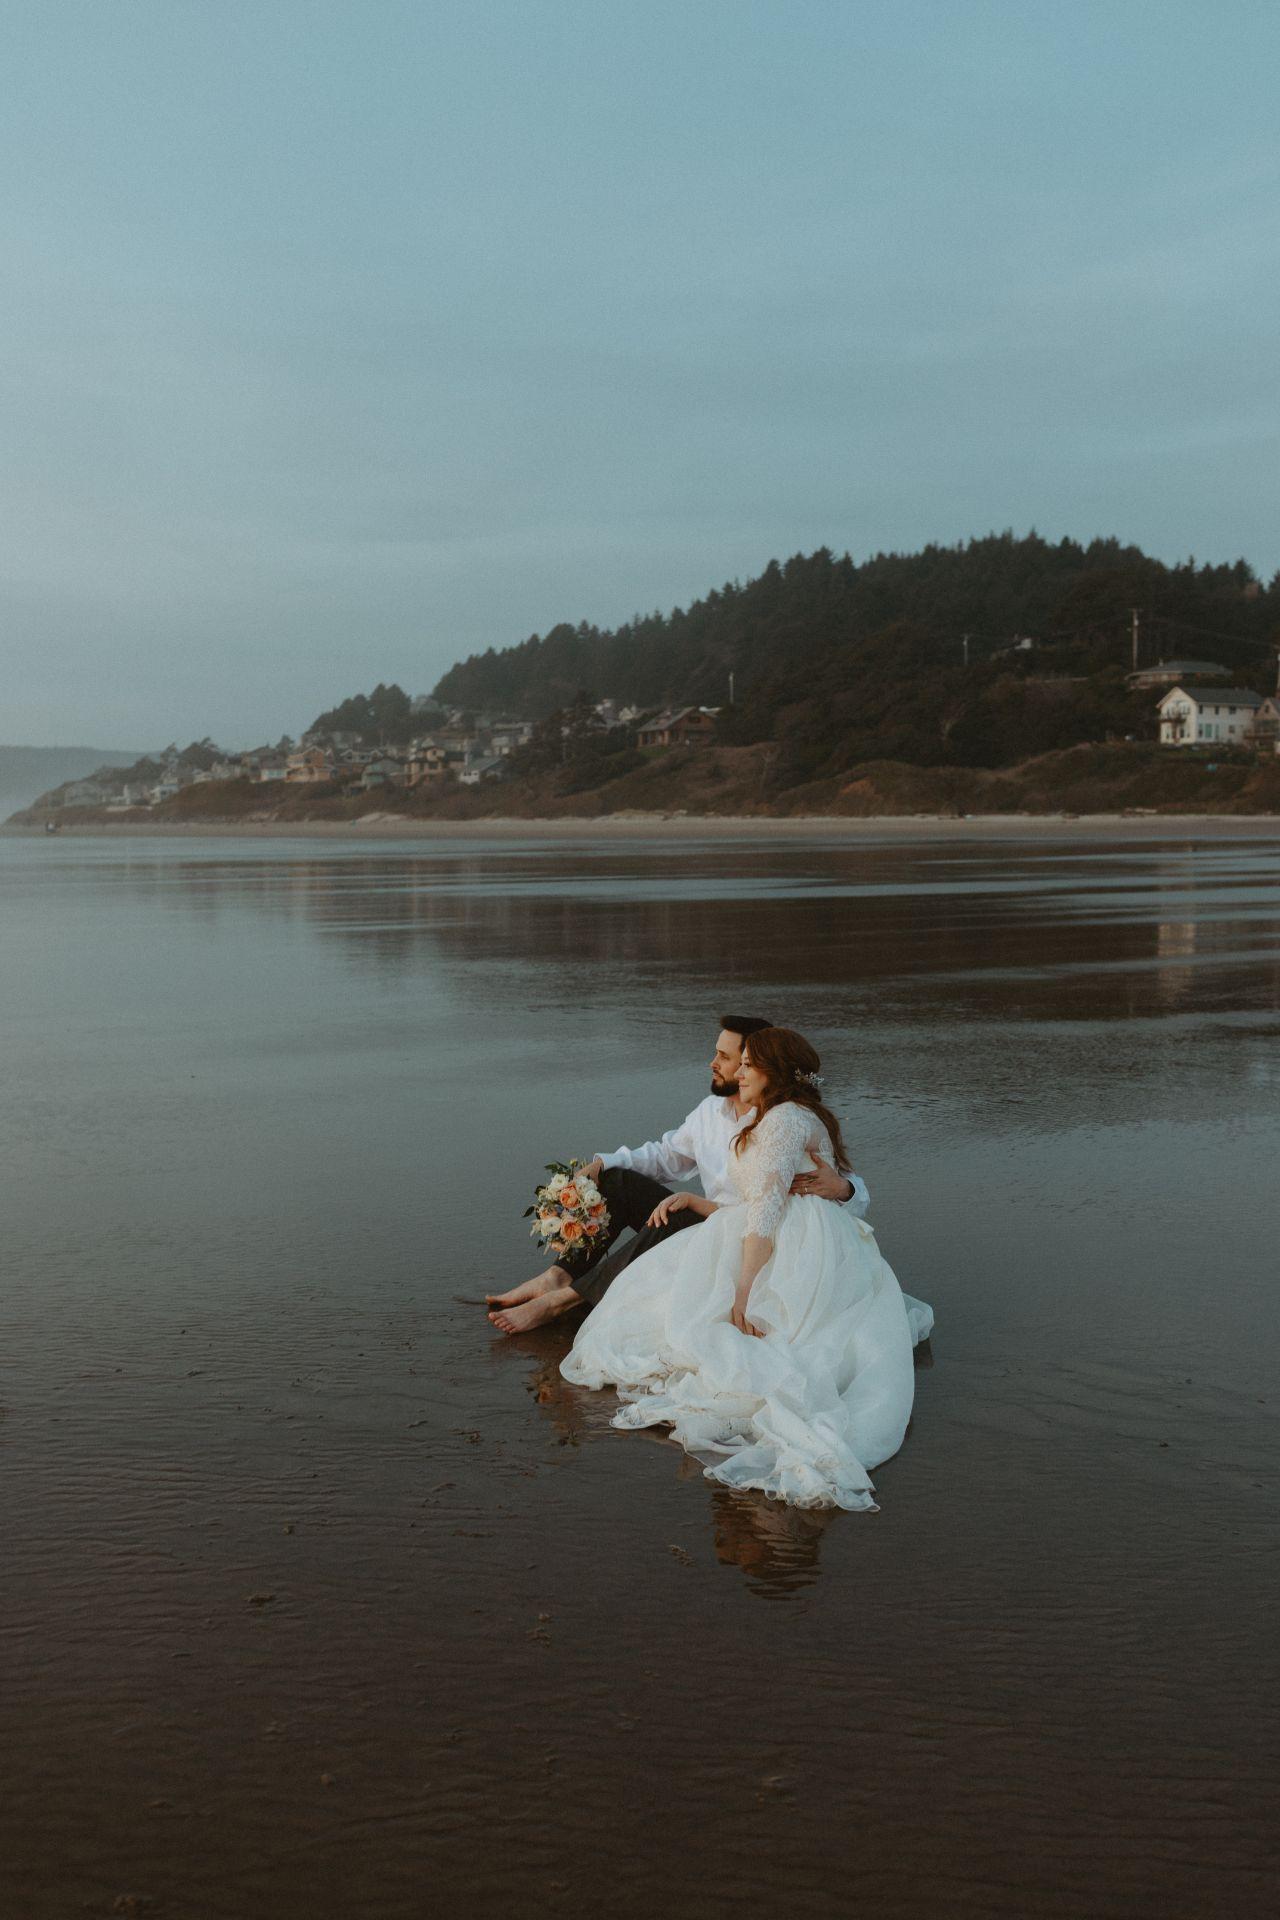 Canon-Beach-Wedding_-PNW-Oregon-Coast_-Lake-Tahoe-Elopement-Photographer_-Emma-Wynn-Paul_-0391-large